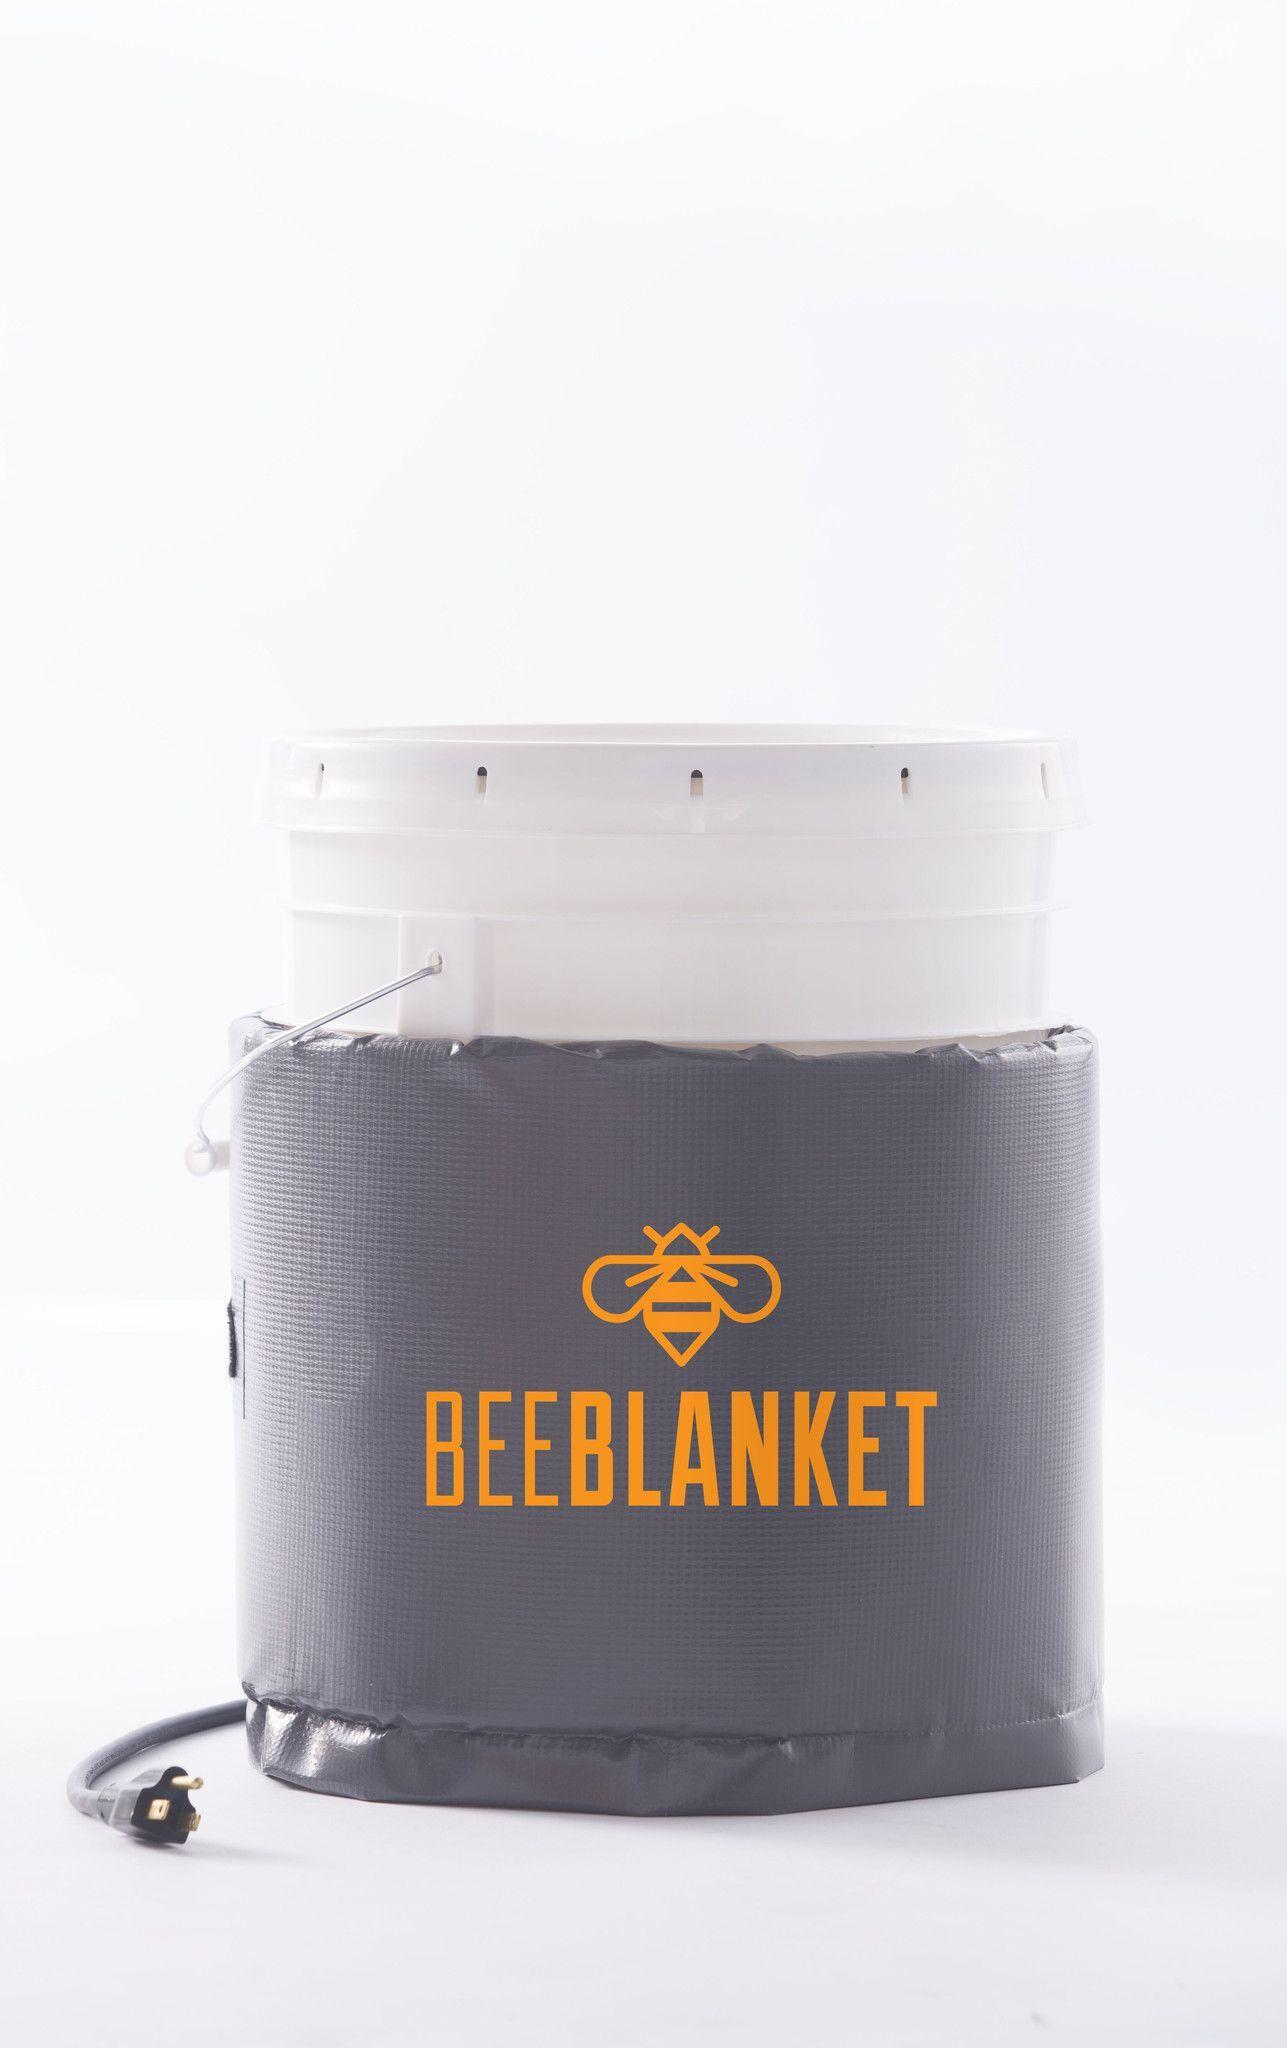 Bb05 bee blanket 5 gallon pail heater 110f 120v 120